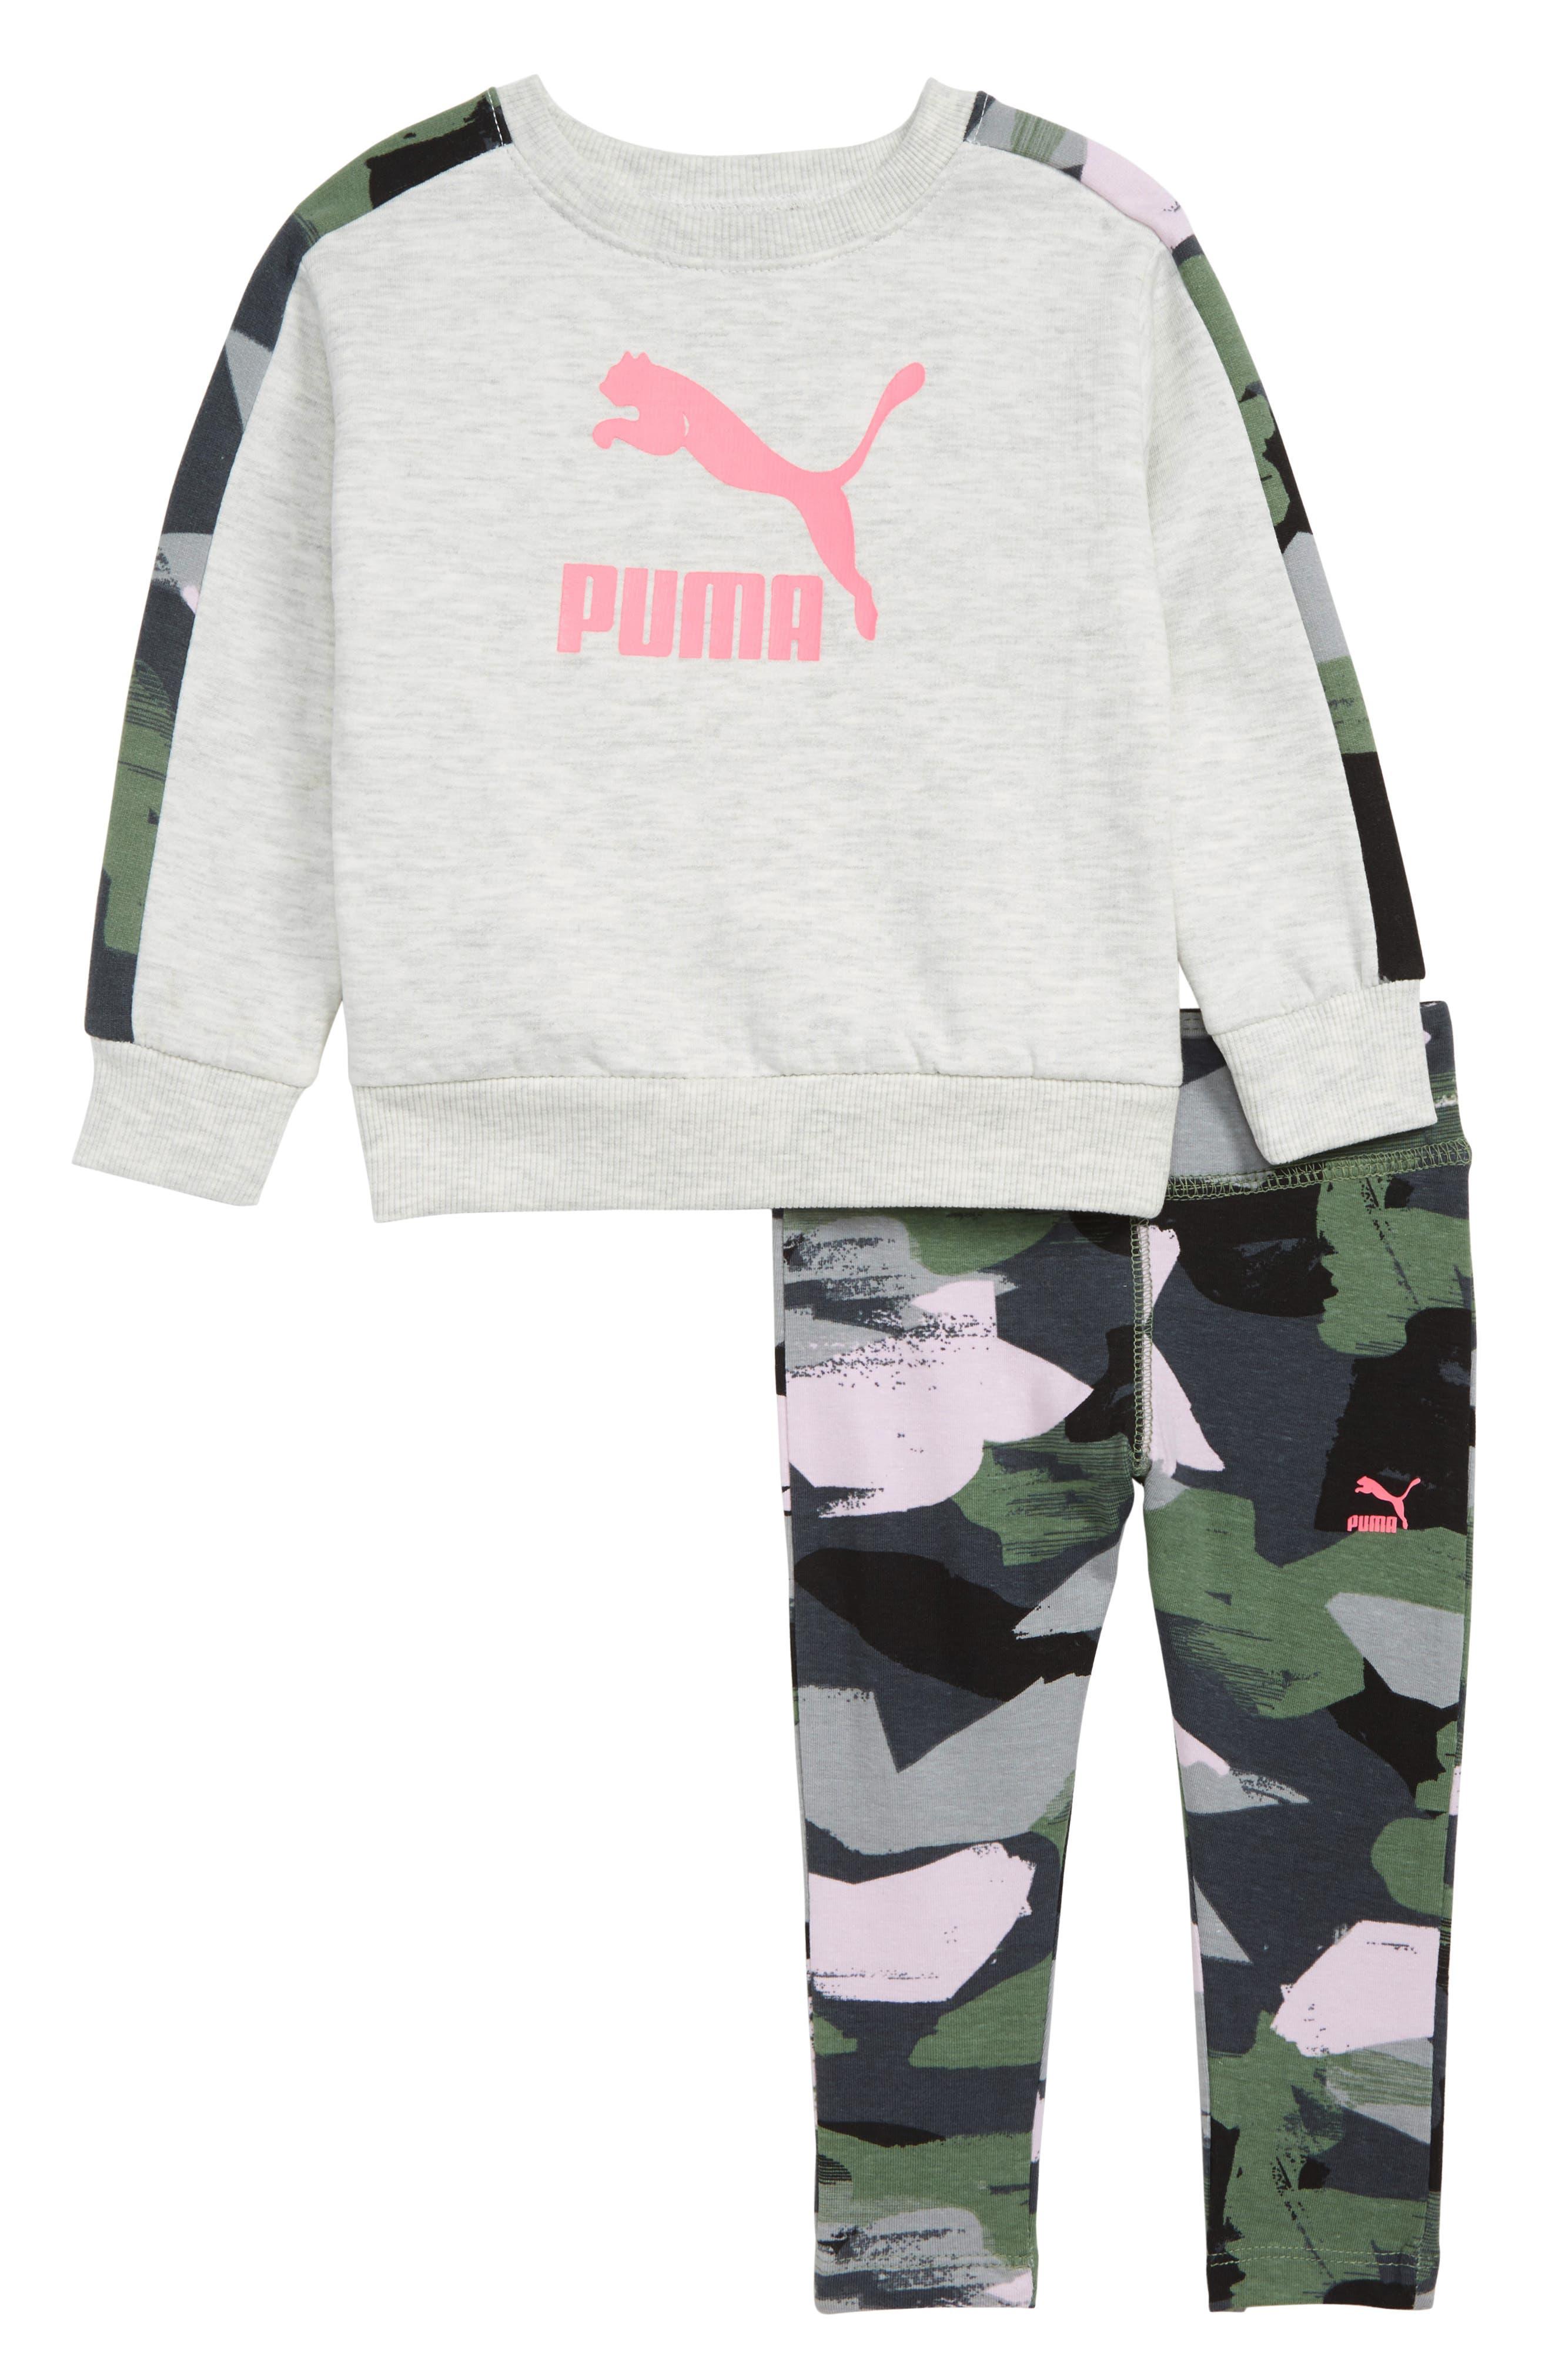 Infant Girls Puma Fleece Crewneck Sweatshirt  Leggings Set